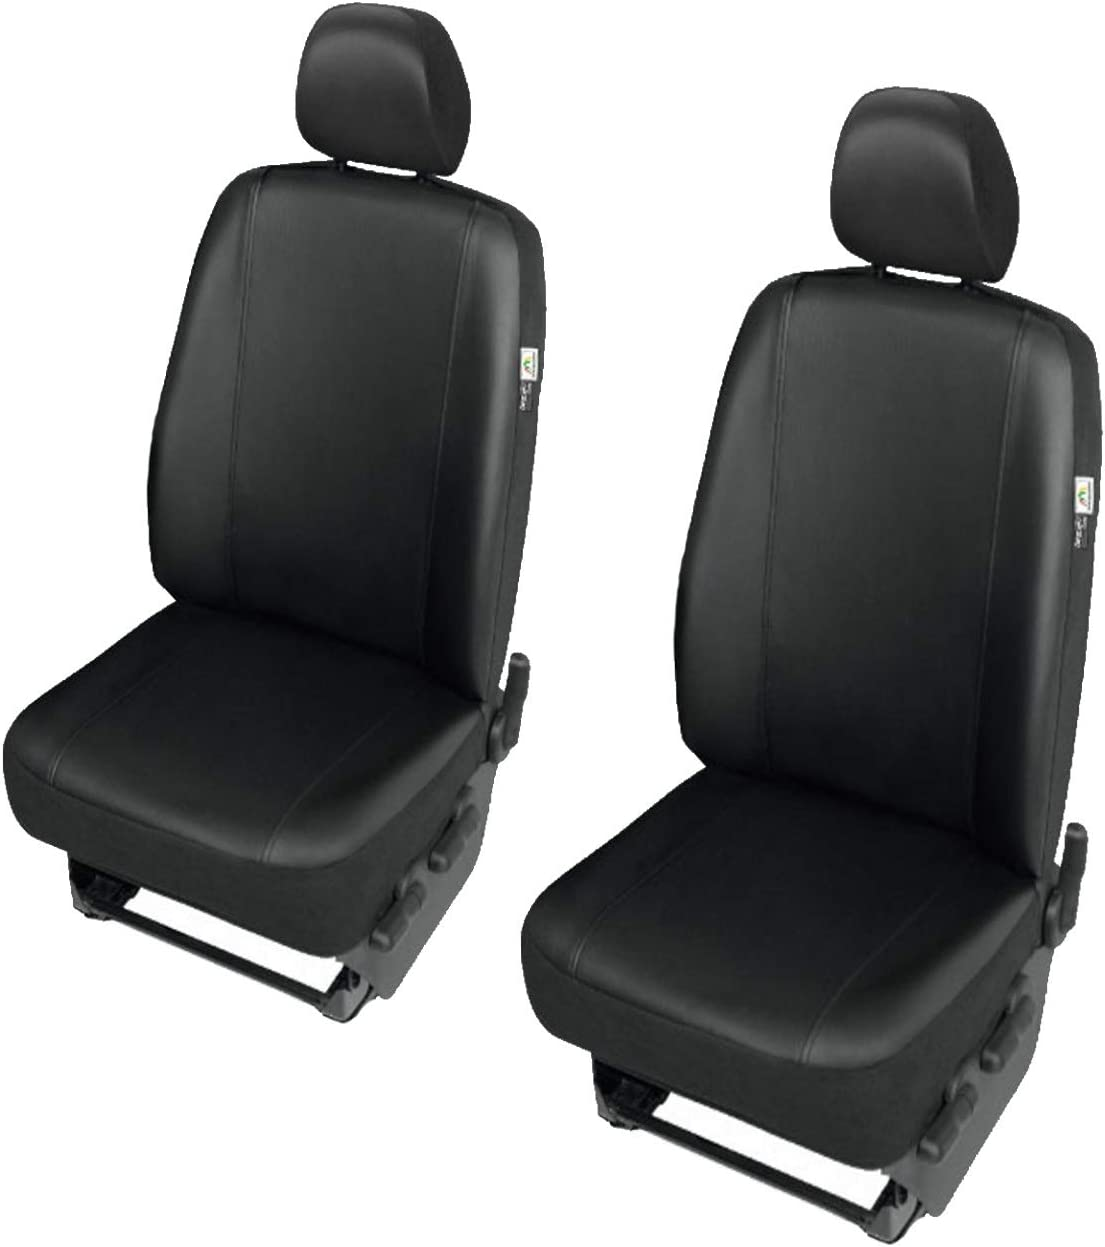 Practical Sitzbezug Für Mercedes Sprinter Ab 2017 Dv11ll Auto